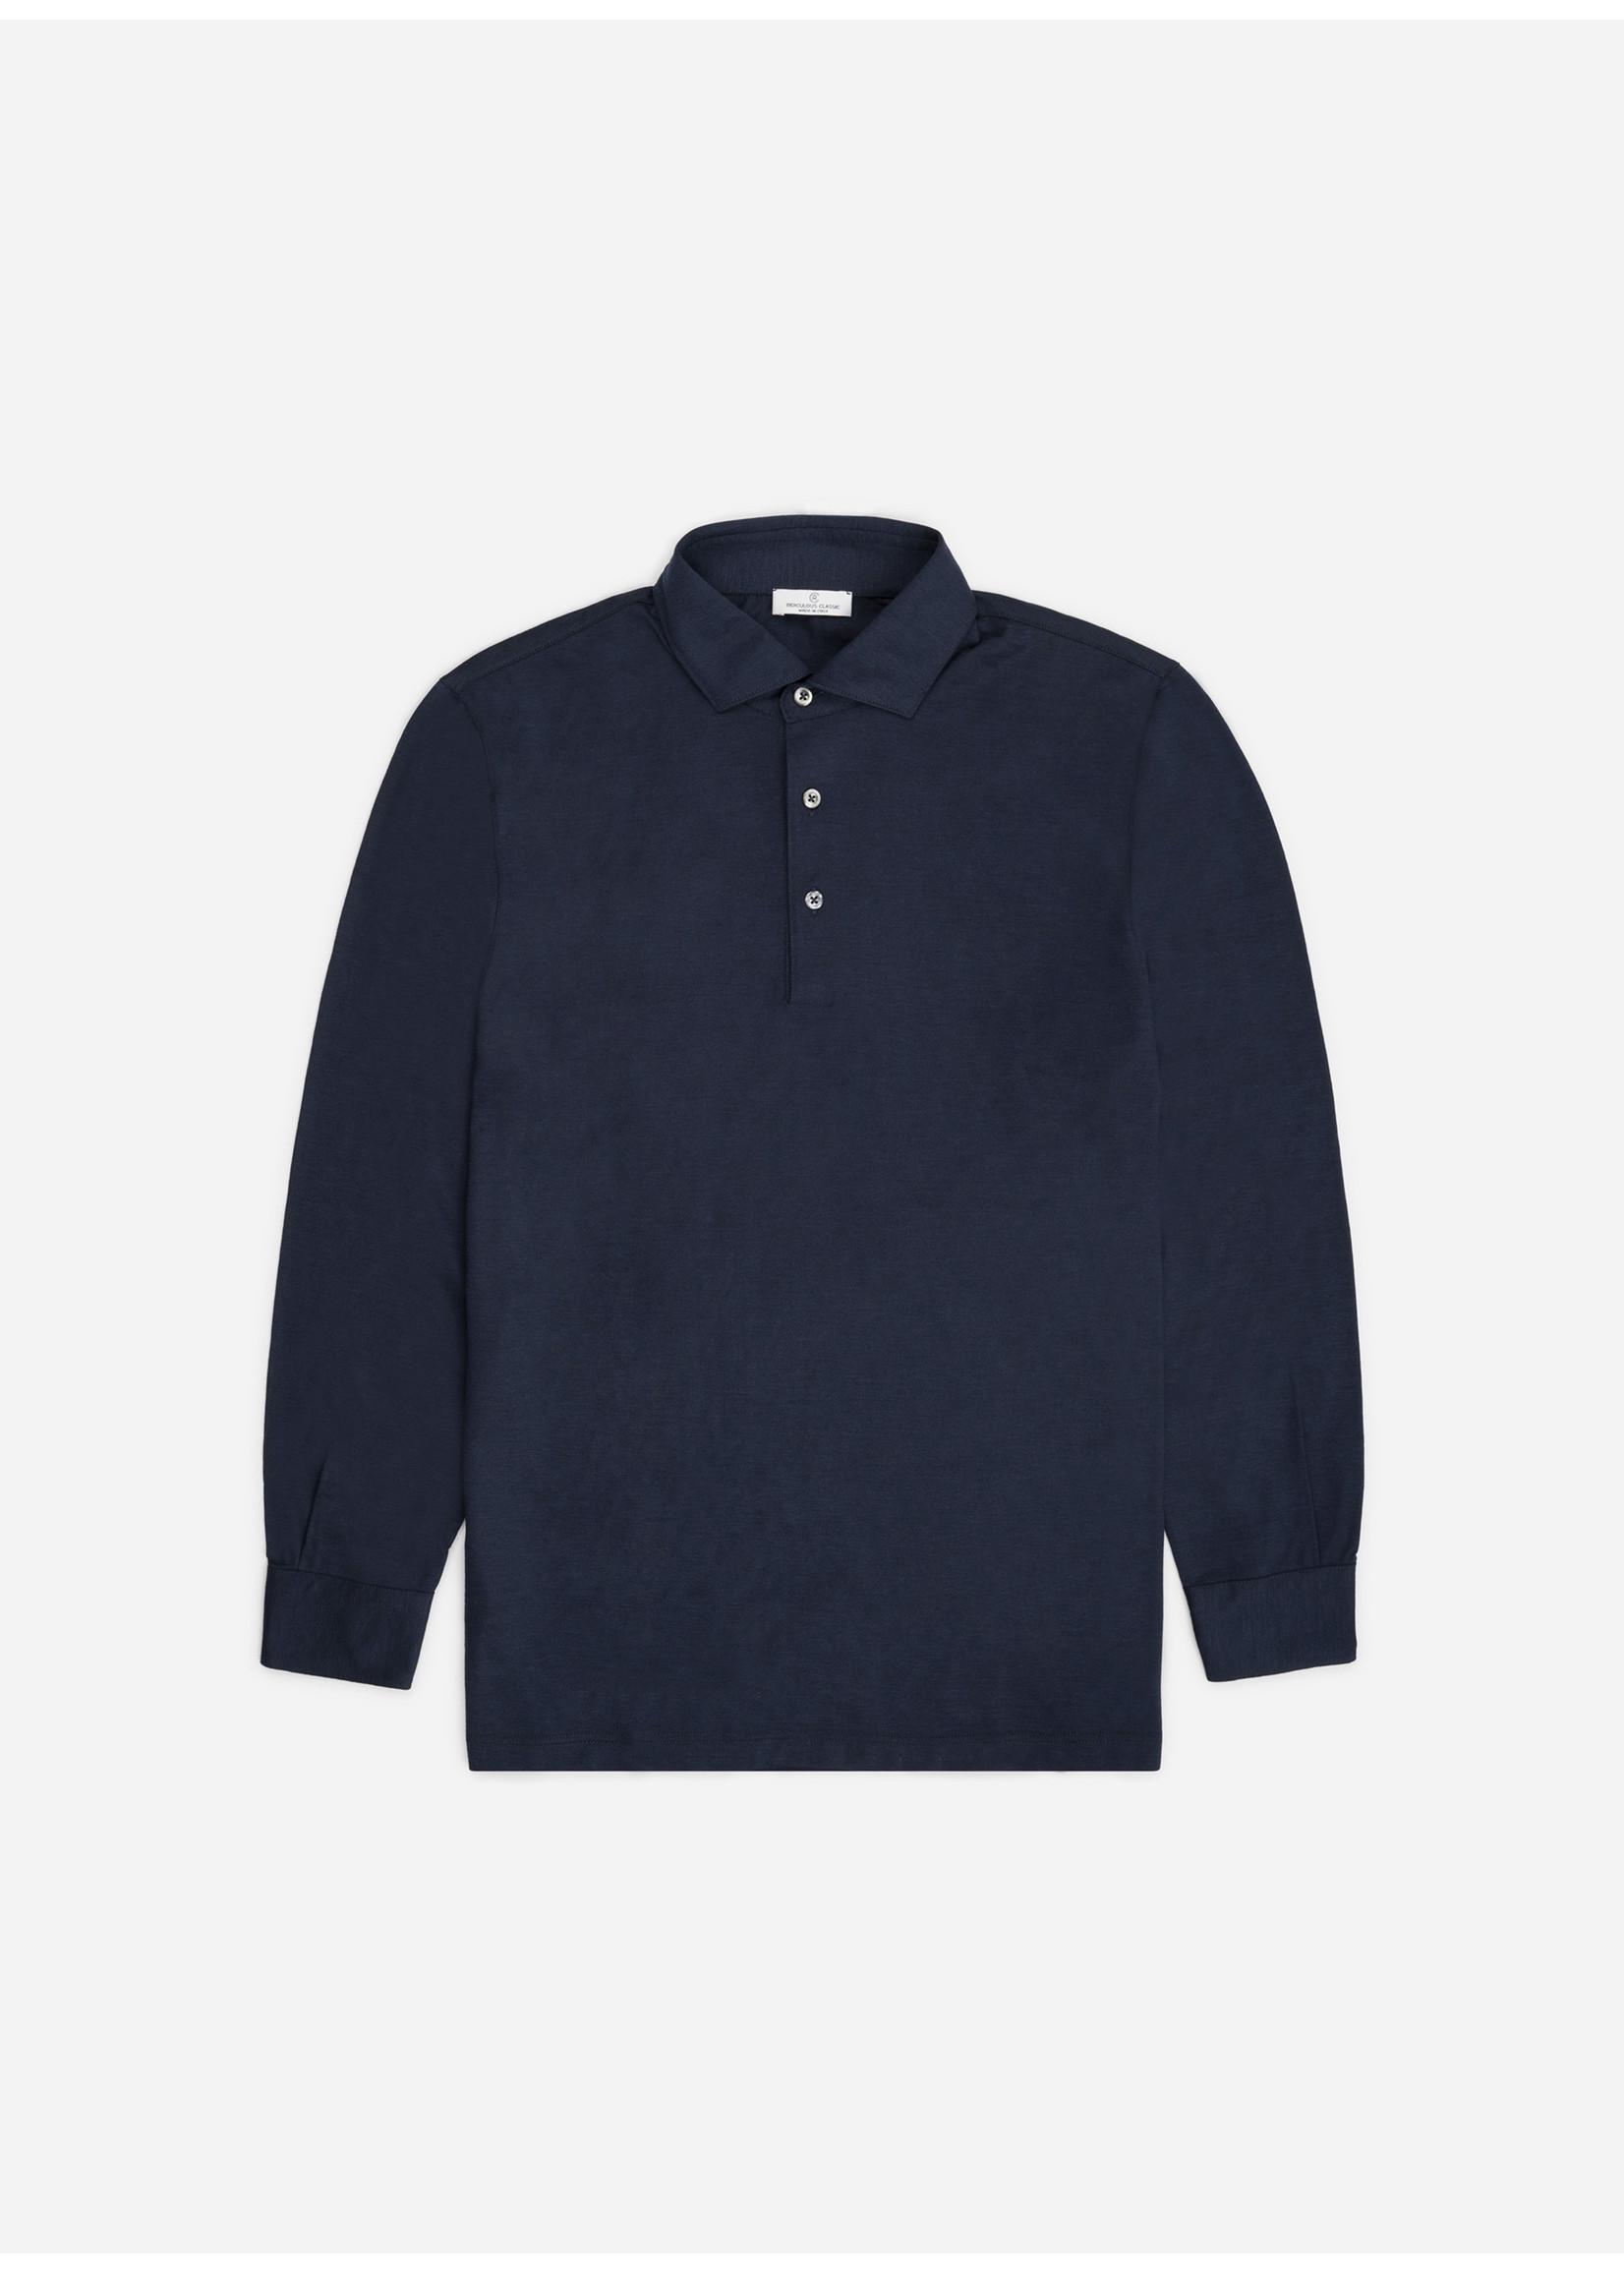 Ridiculous Classic Shirt Polo Long Sleeve Navy